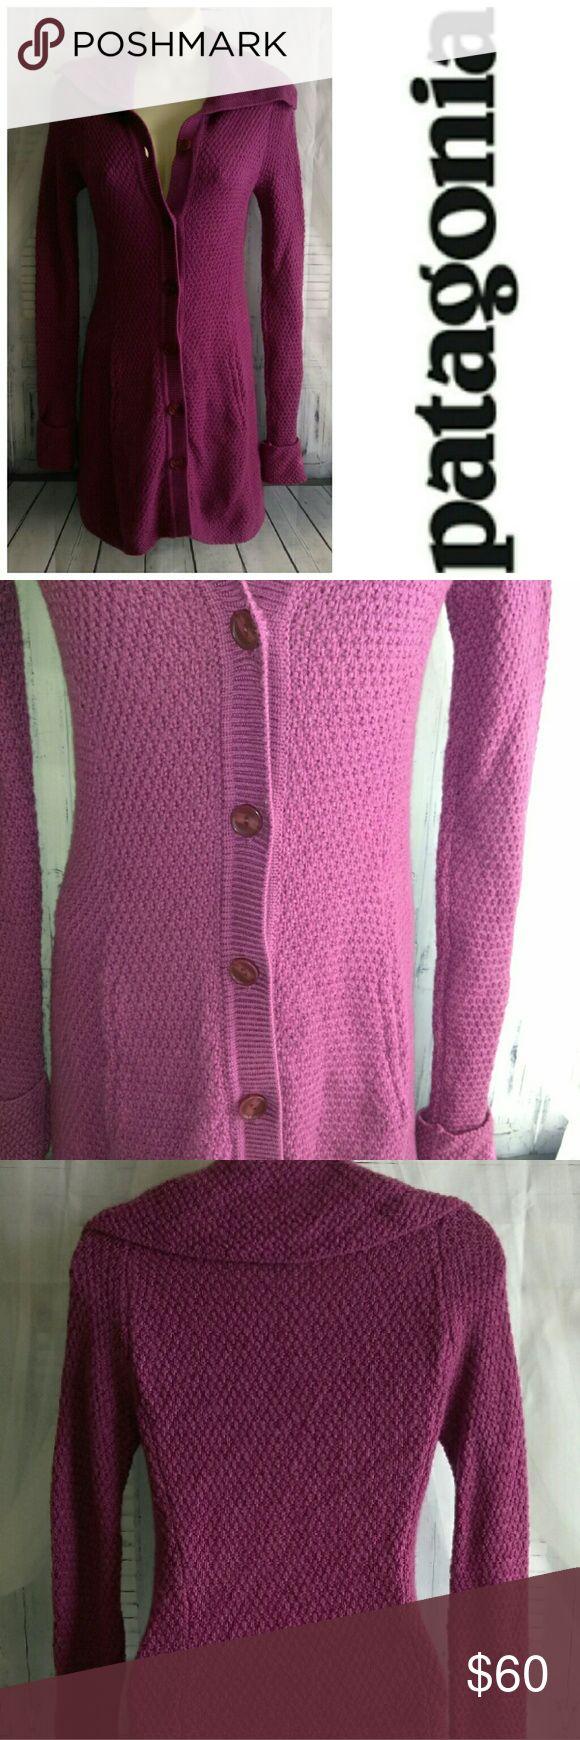 Long Knit Button Cardigan Sweater 100% Merino Wool long sweater coat Patagonia Sweaters Cardigans